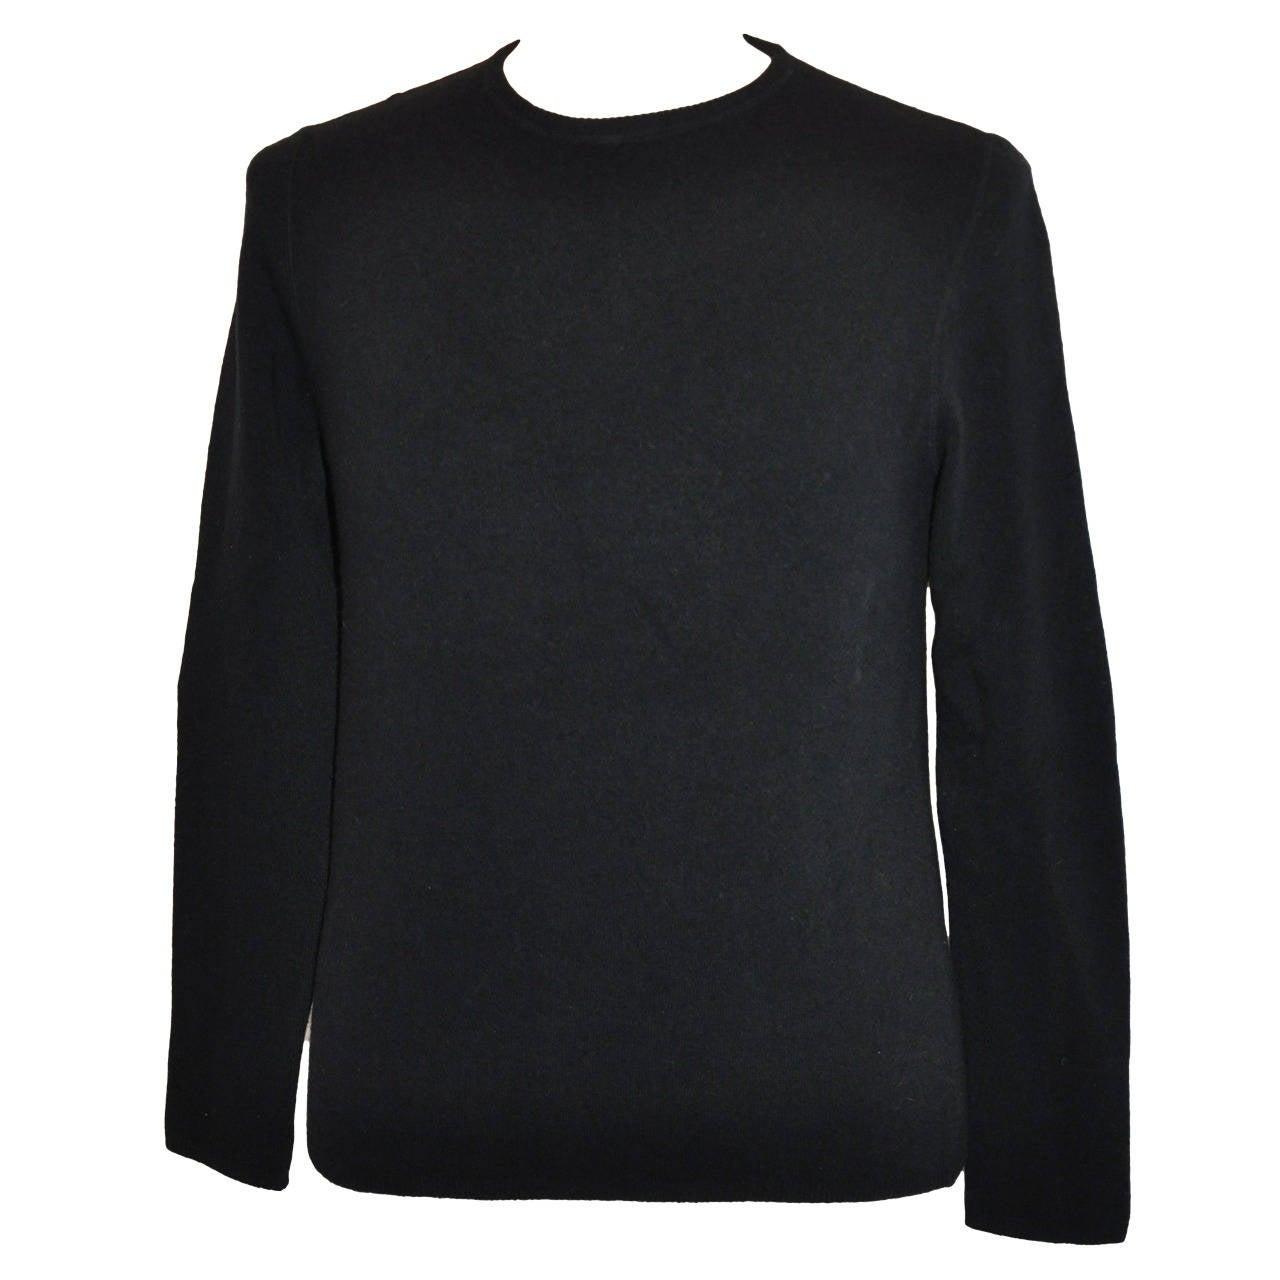 Prada Men's Black Crew Neck Pullover